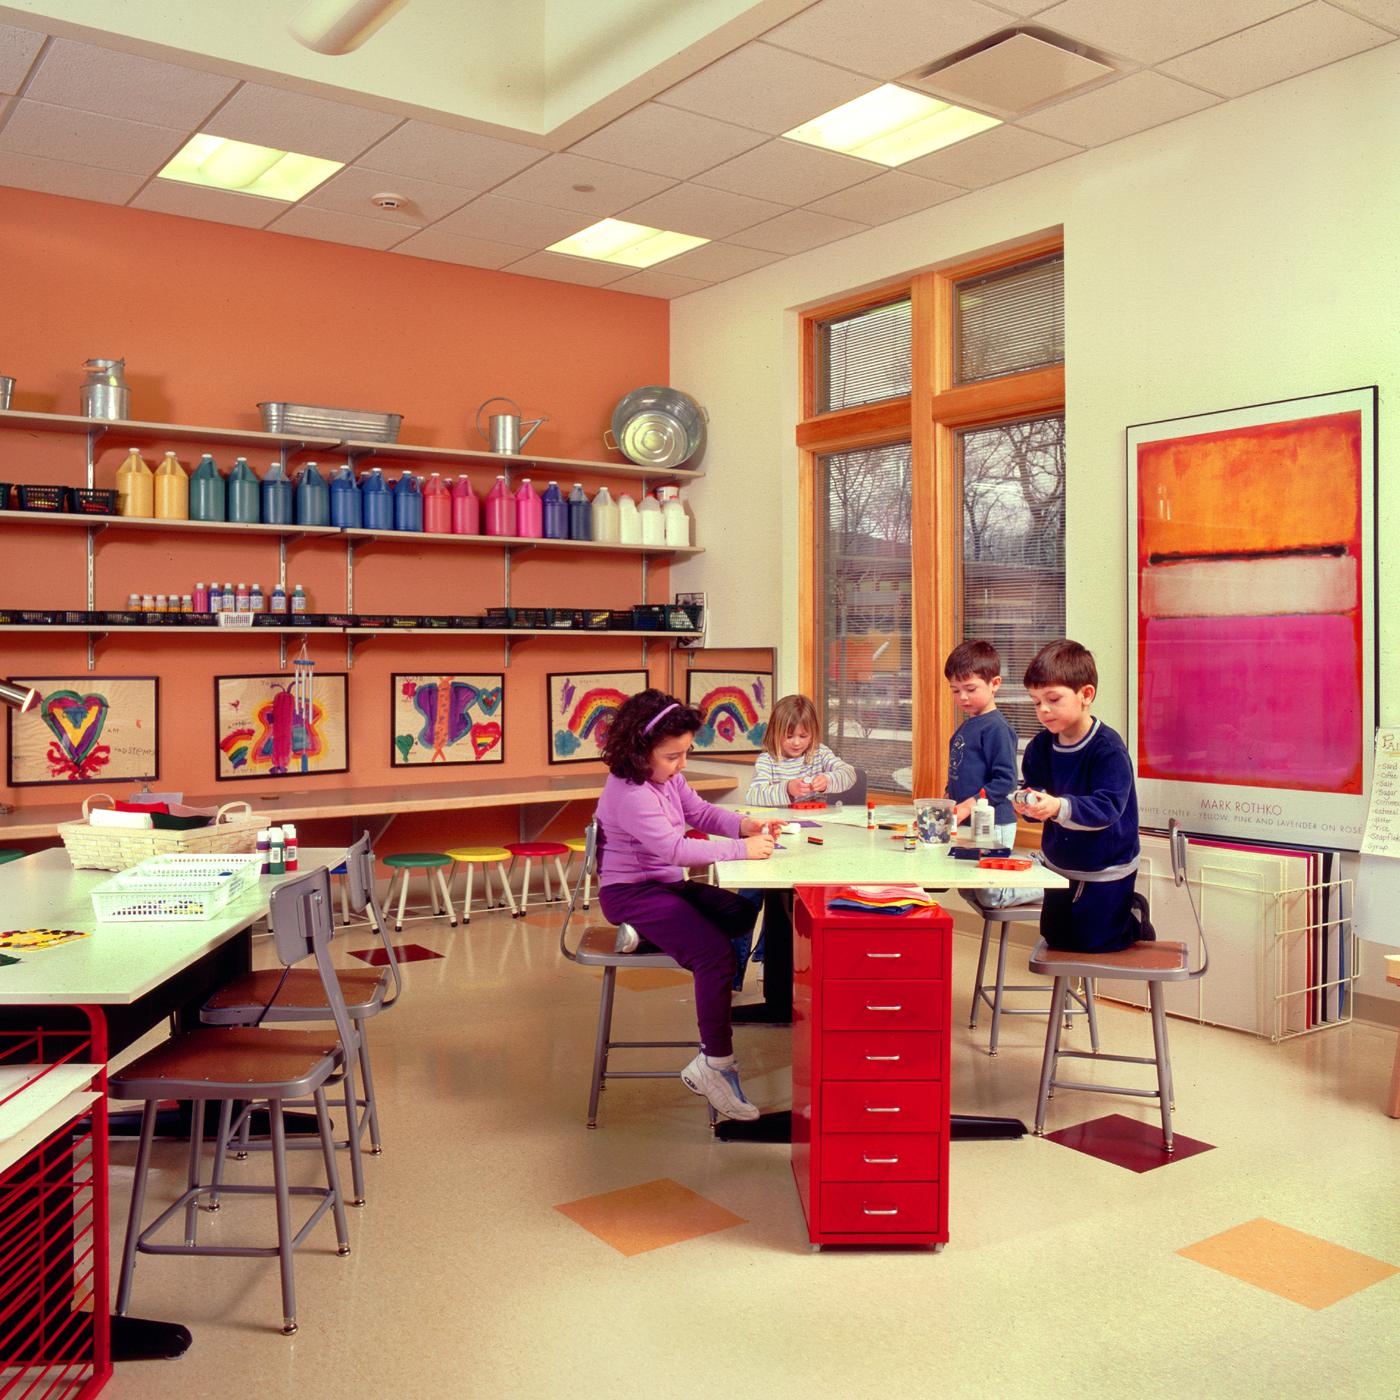 01.6_phopro-int-artroom kids working-200ppi-7x7.jpg